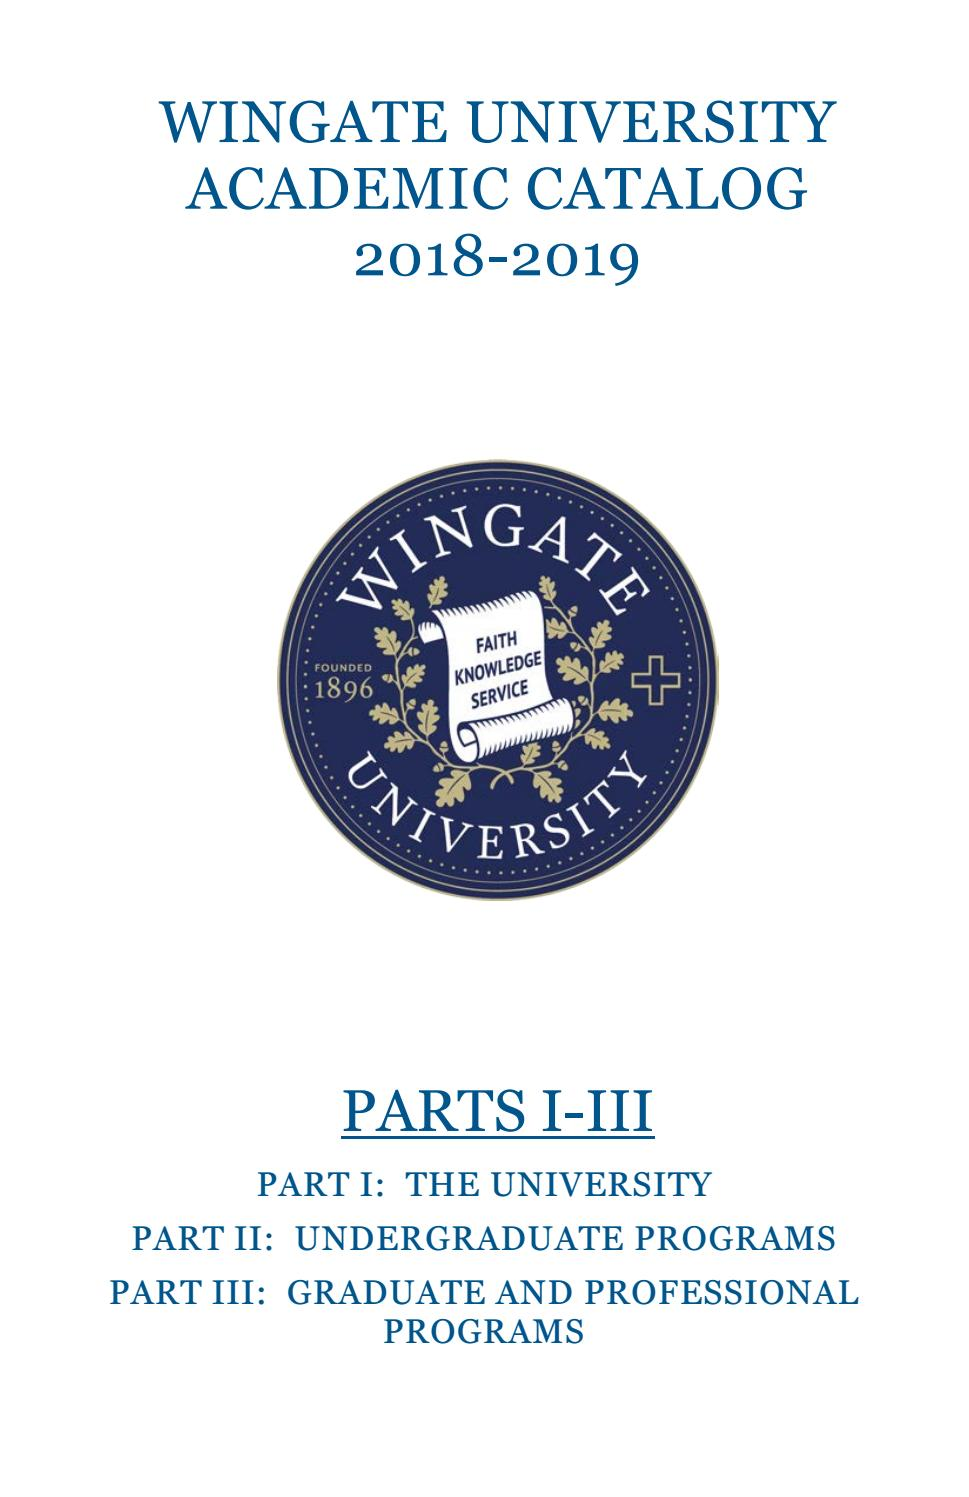 97400df67fed 2018-19 Wingate University Academic Catalog by Wingate University - issuu